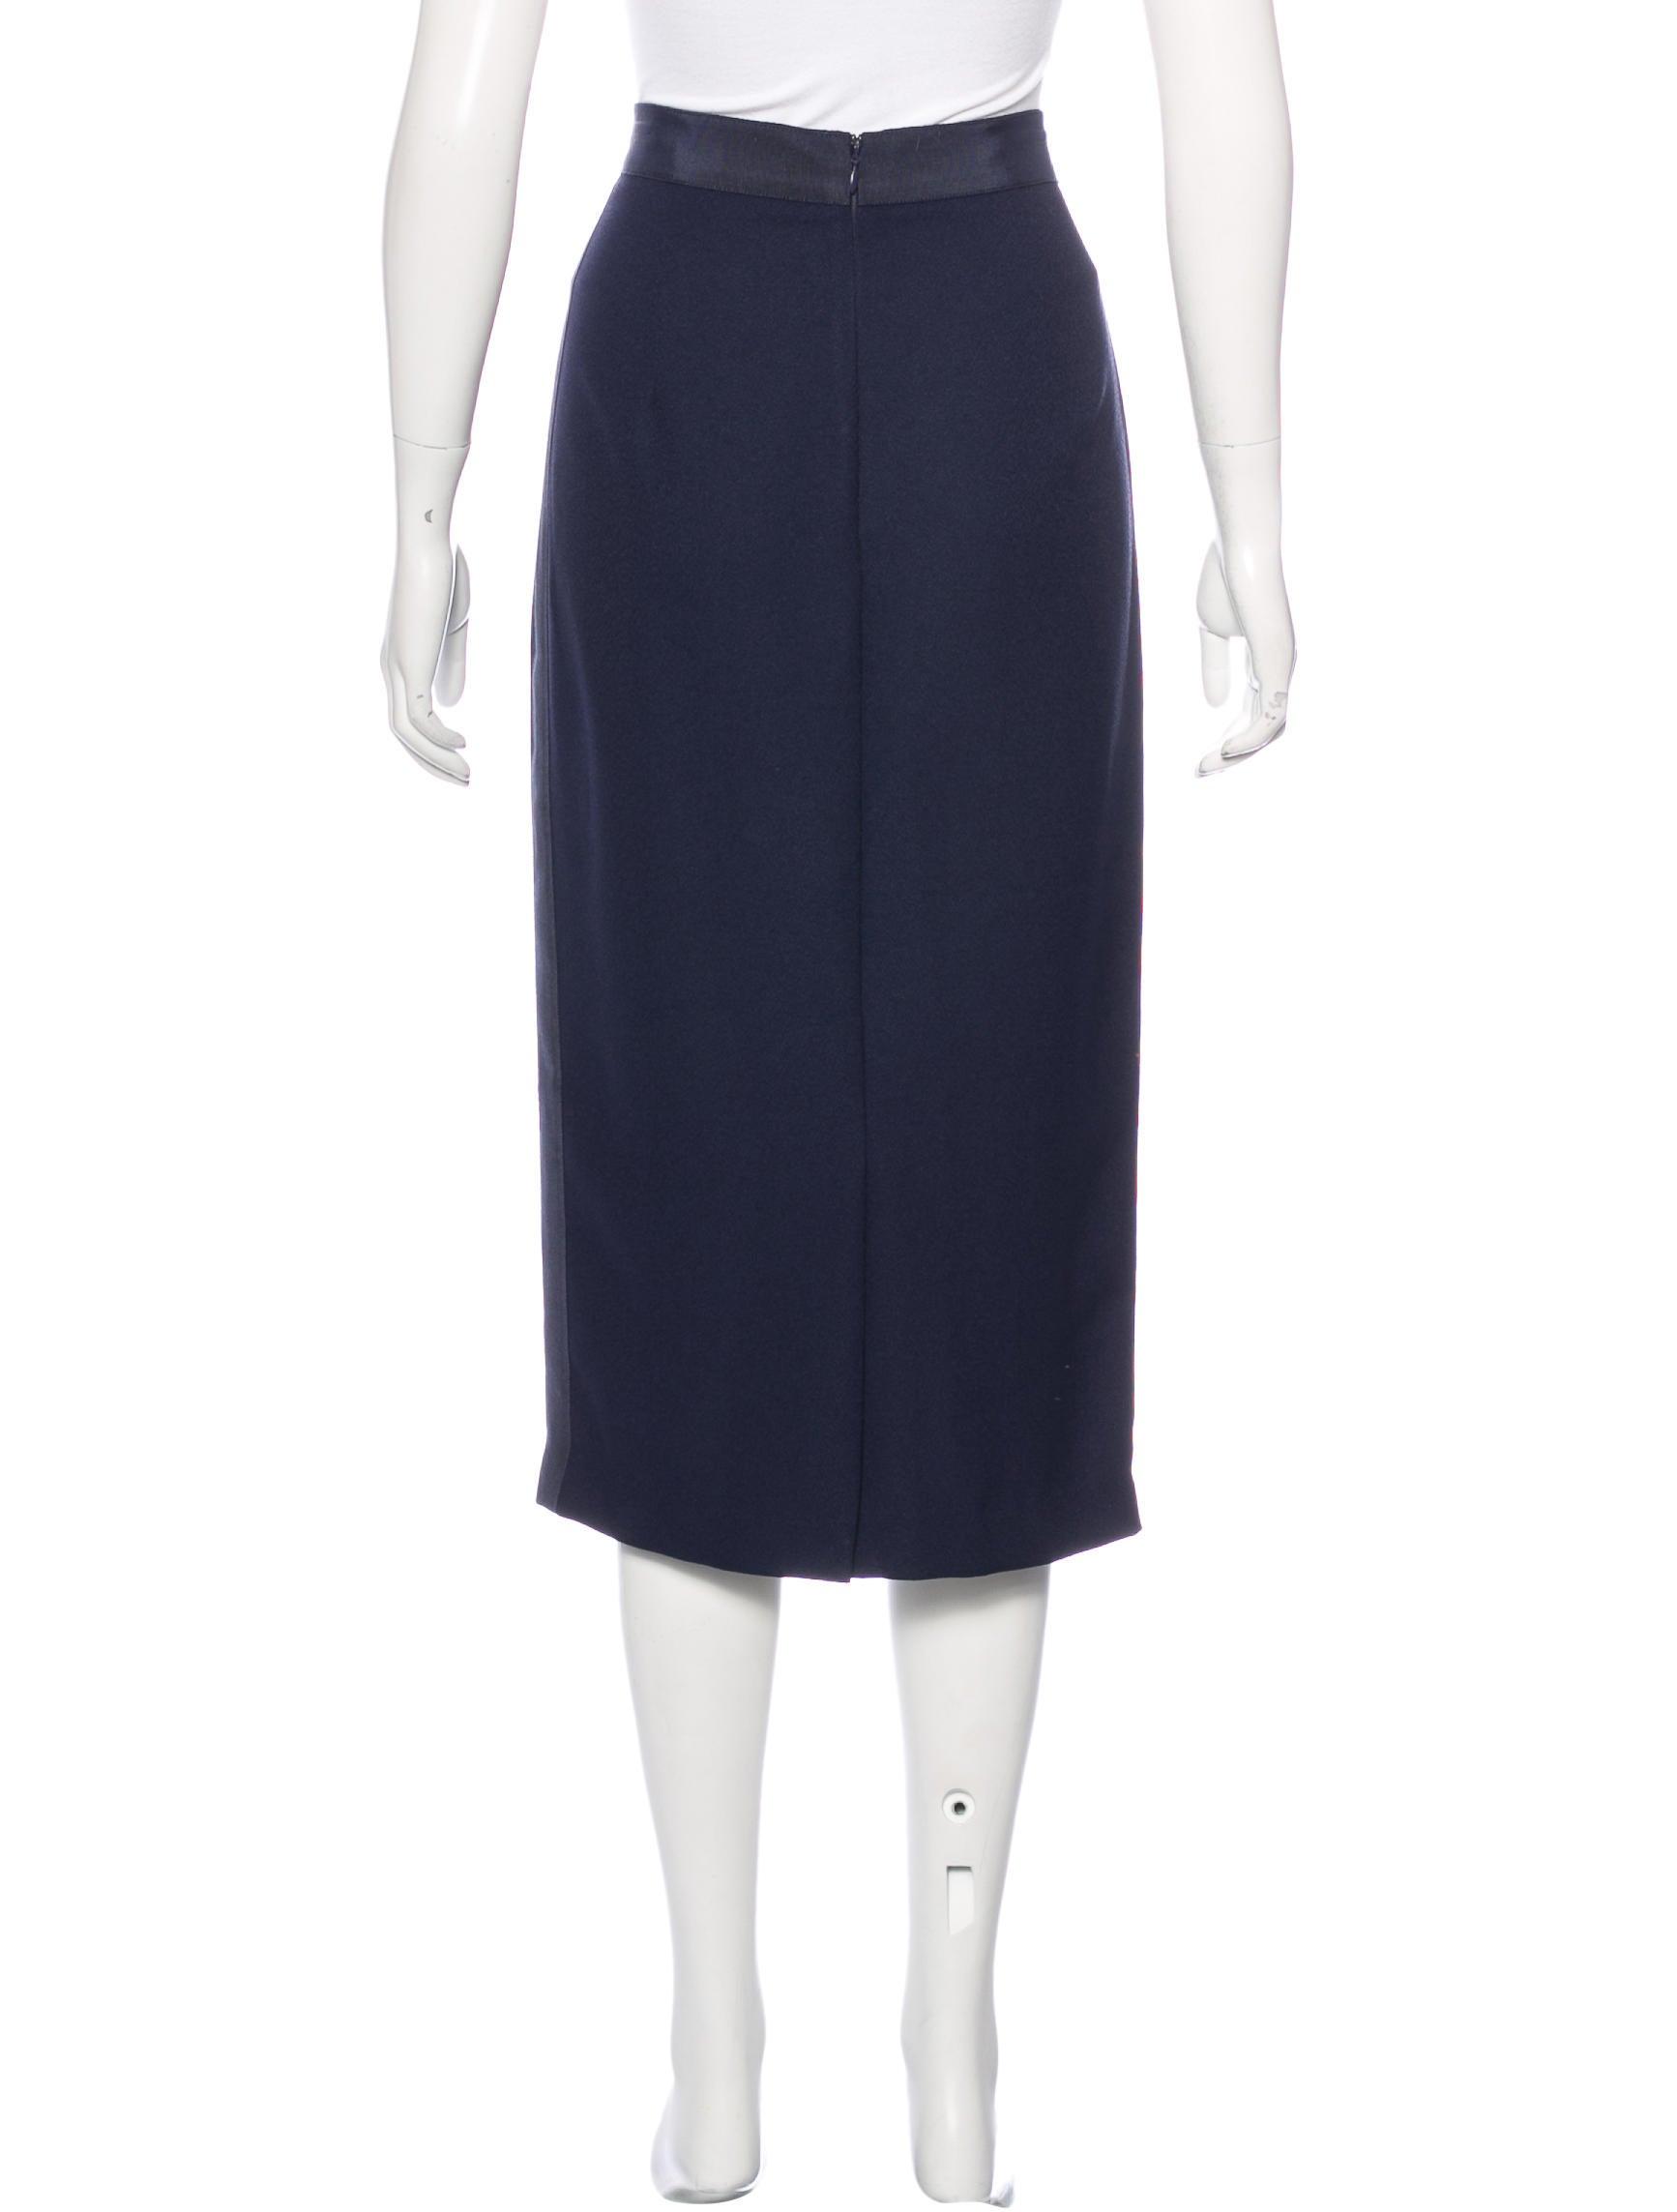 kaelen midi pencil skirt skirts wk520867 the realreal